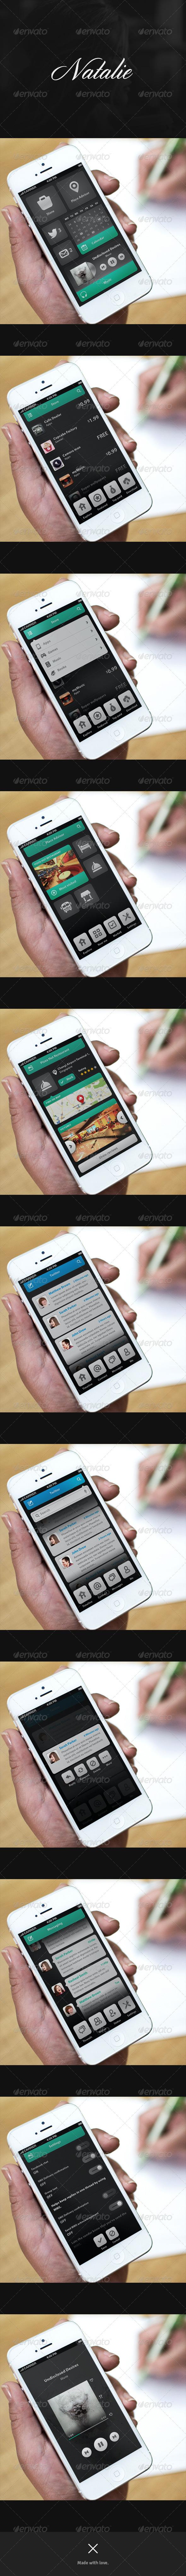 GraphicRiver Phone UI Retina Natalie 6394698